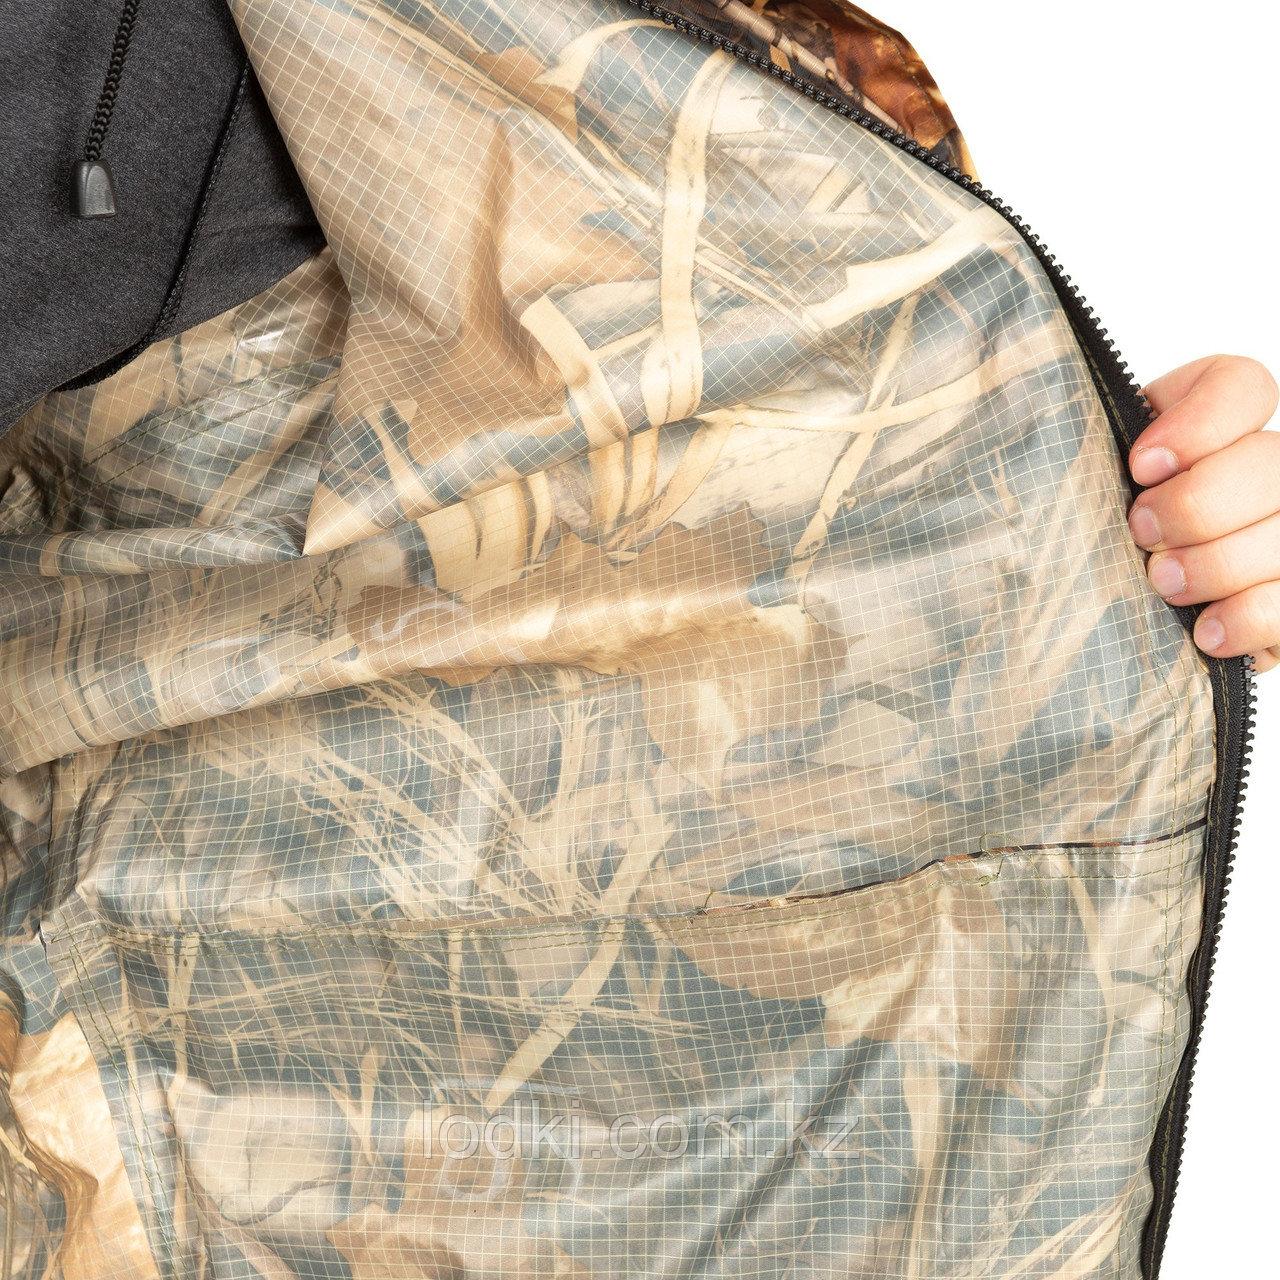 Костюм дождевик ВВЗ Склон2 цвет Камыш ткань Таффета 3000мм Размер от44до64 - фото 5